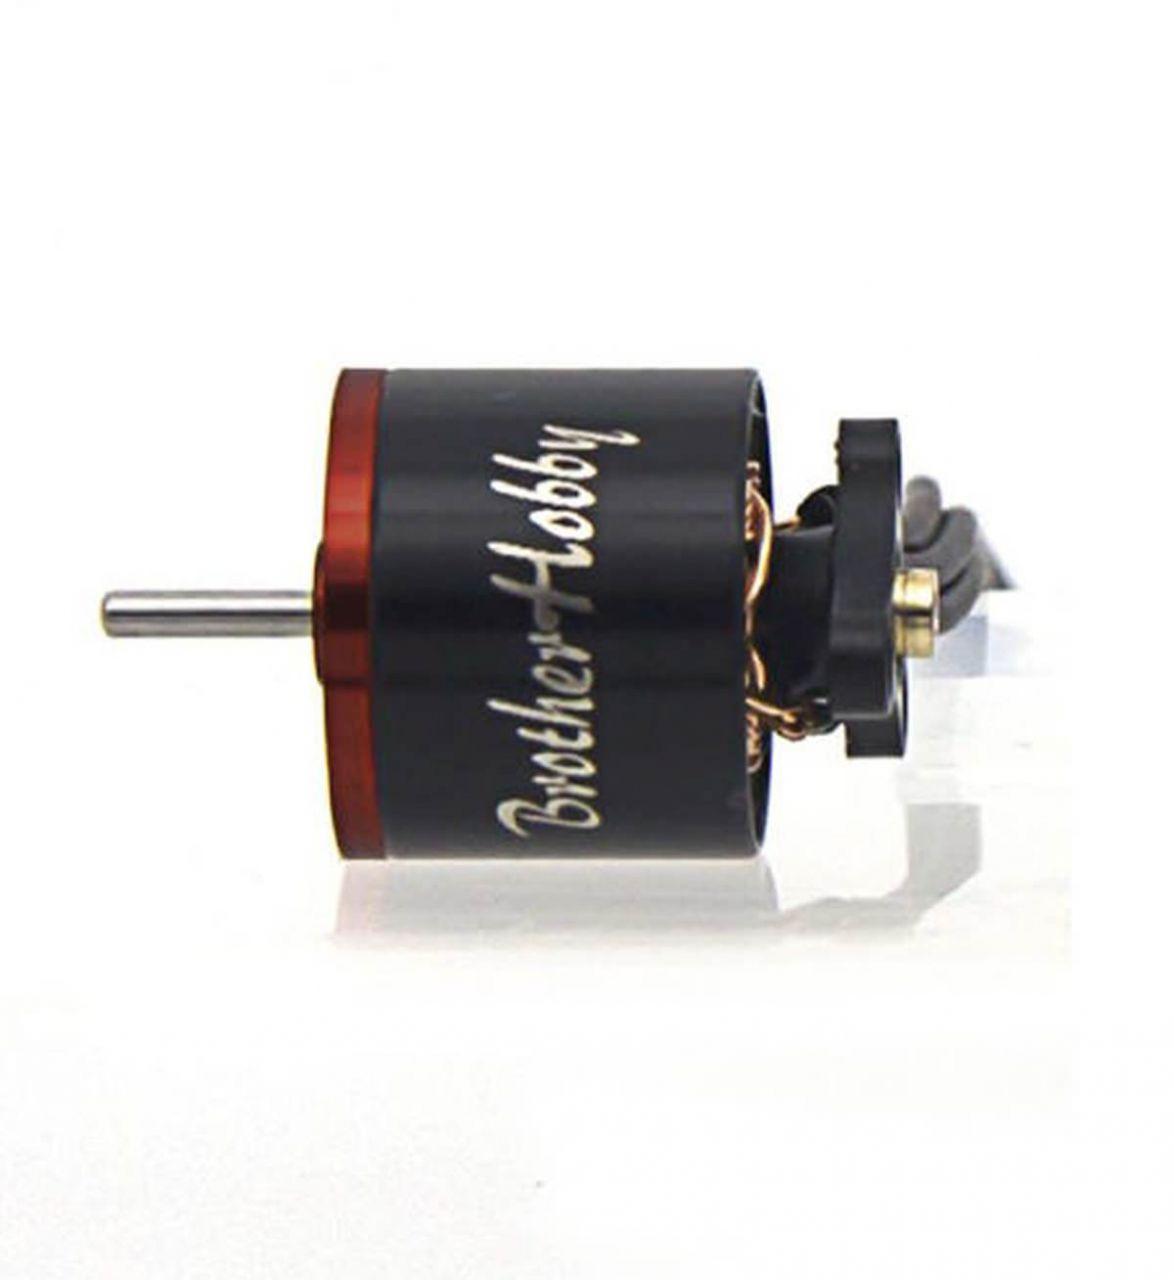 Brotherhobby 0706 12000kv Micro FPV Racing Brushless Motor 1S-2S 3g